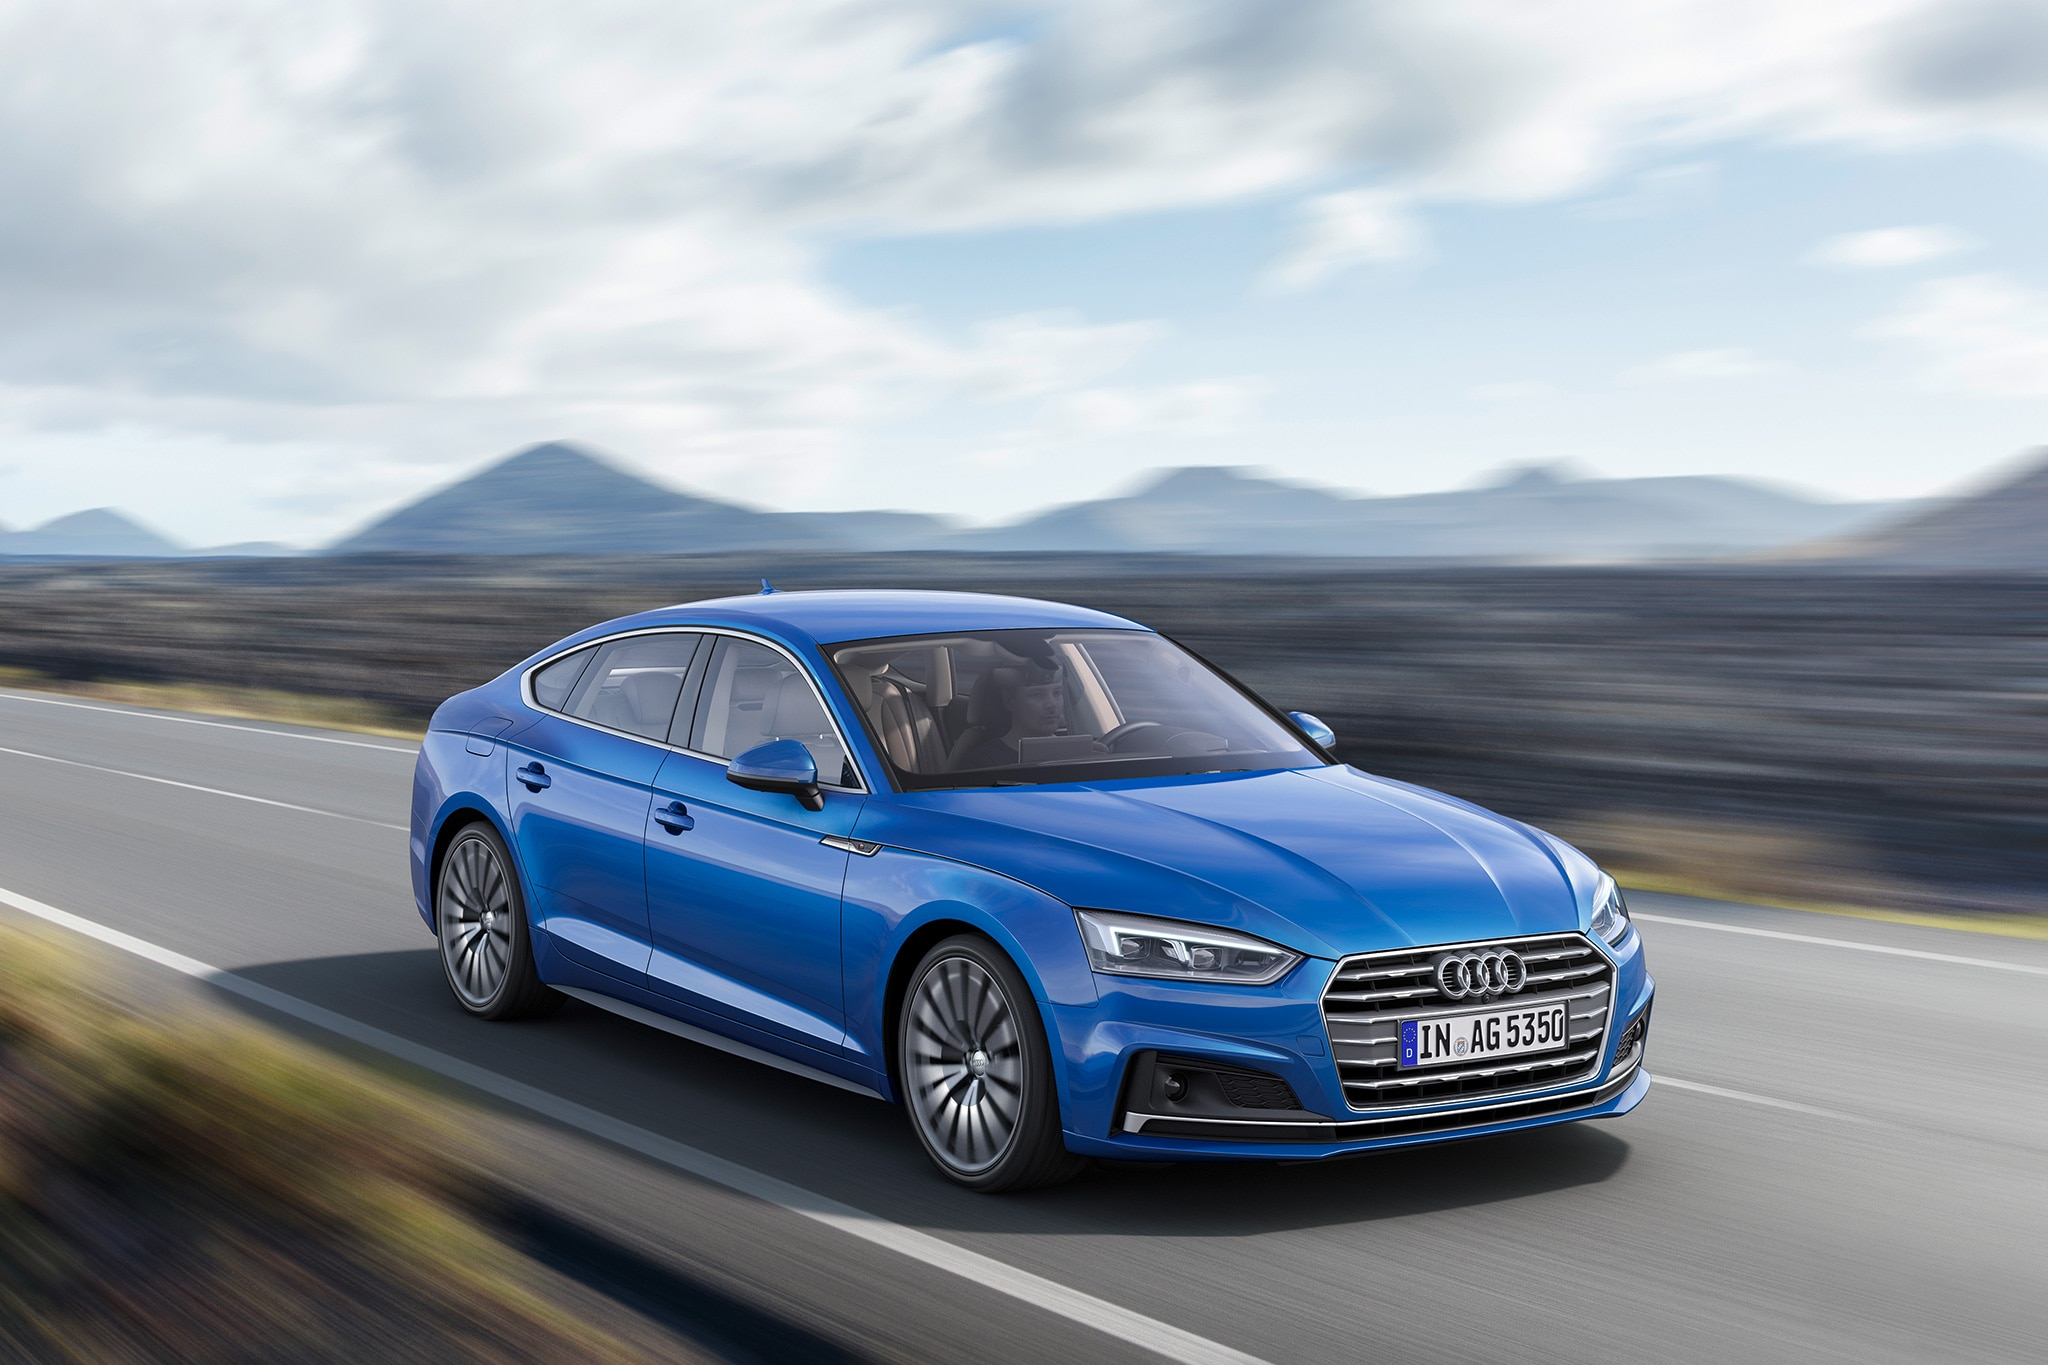 Five-Door Audi A5/S5 Sportback Debuts for Europe ...